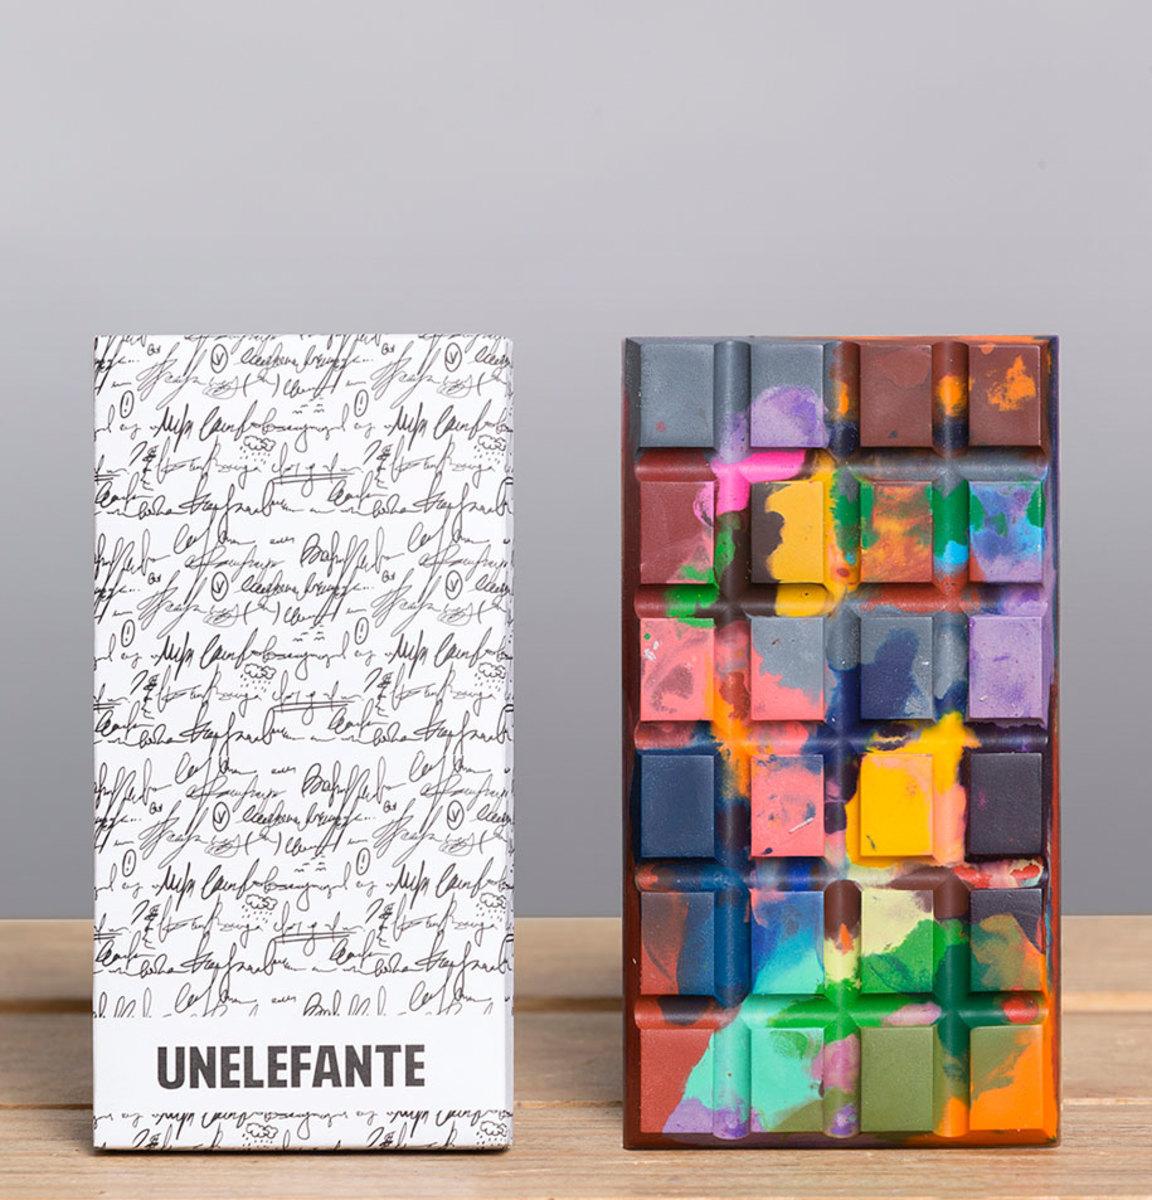 colourful-chocolate-bars-unelefante-3